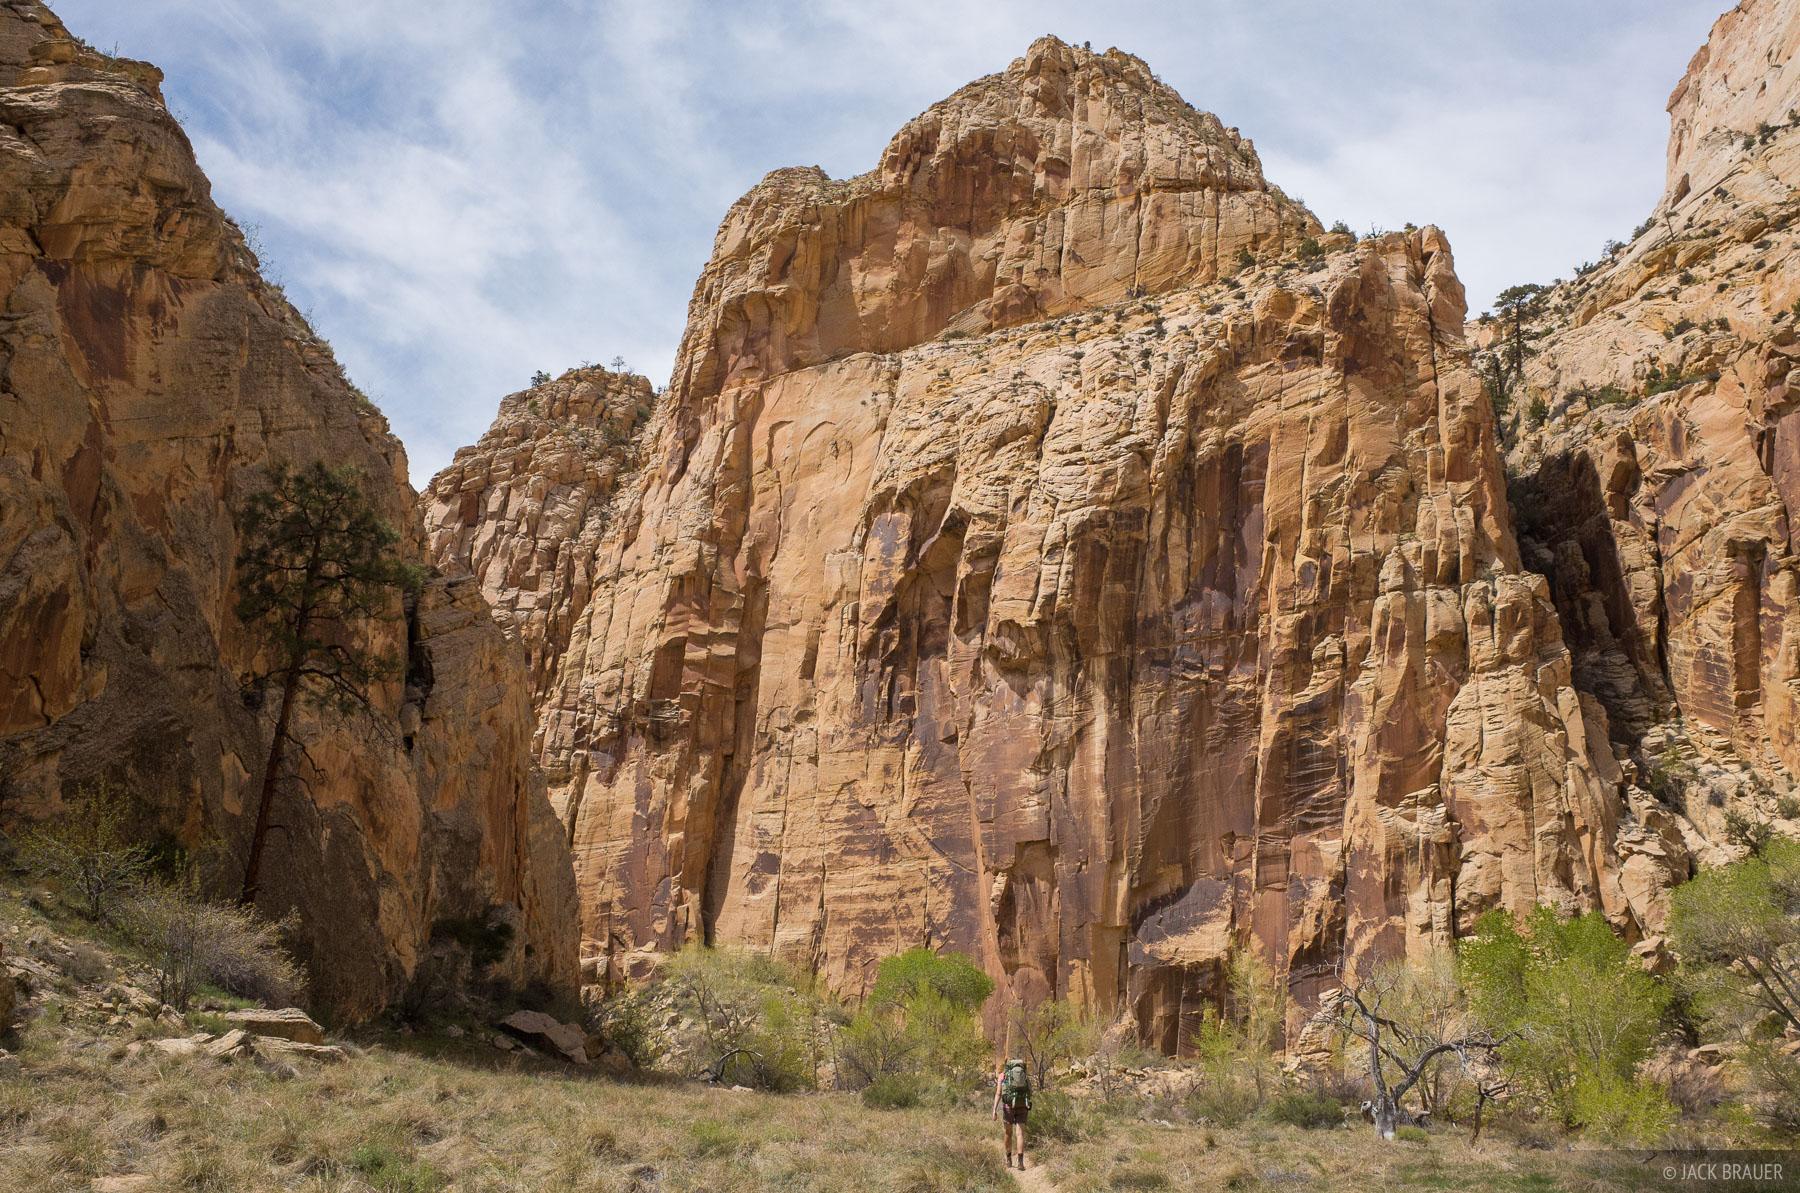 Hiking up the Escalante River canyon.